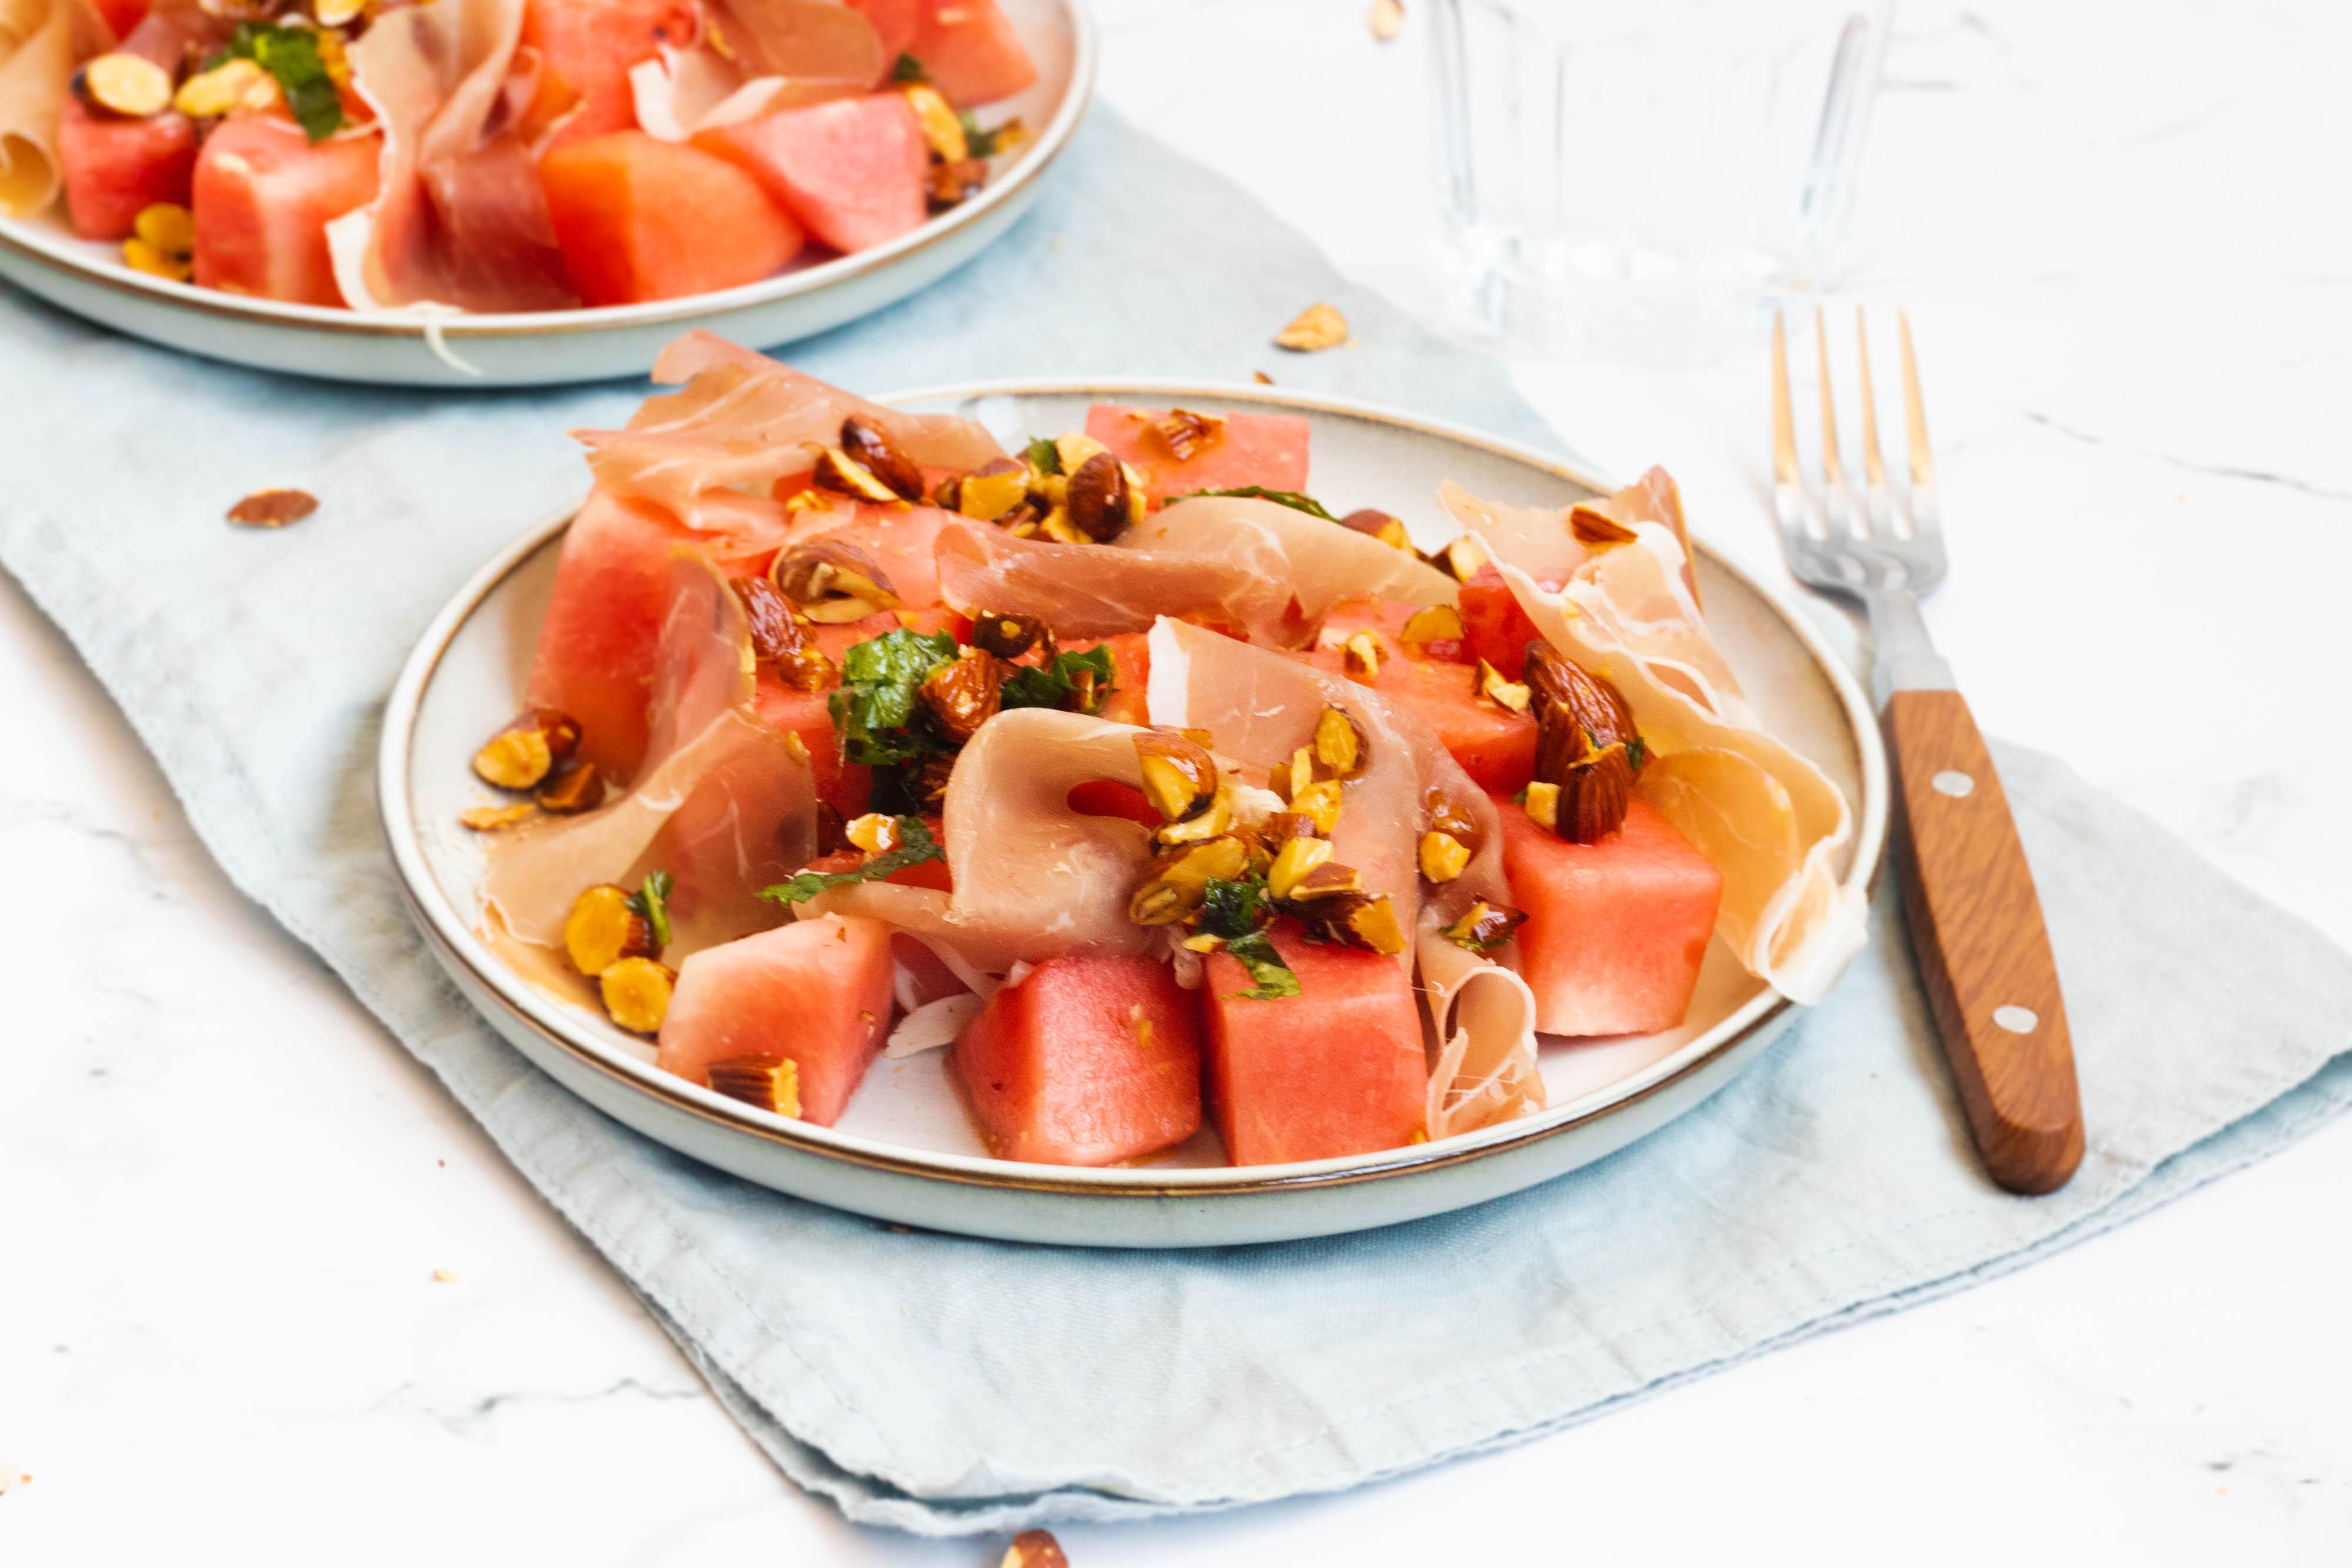 Watermeloen Salade met Rauwe Ham